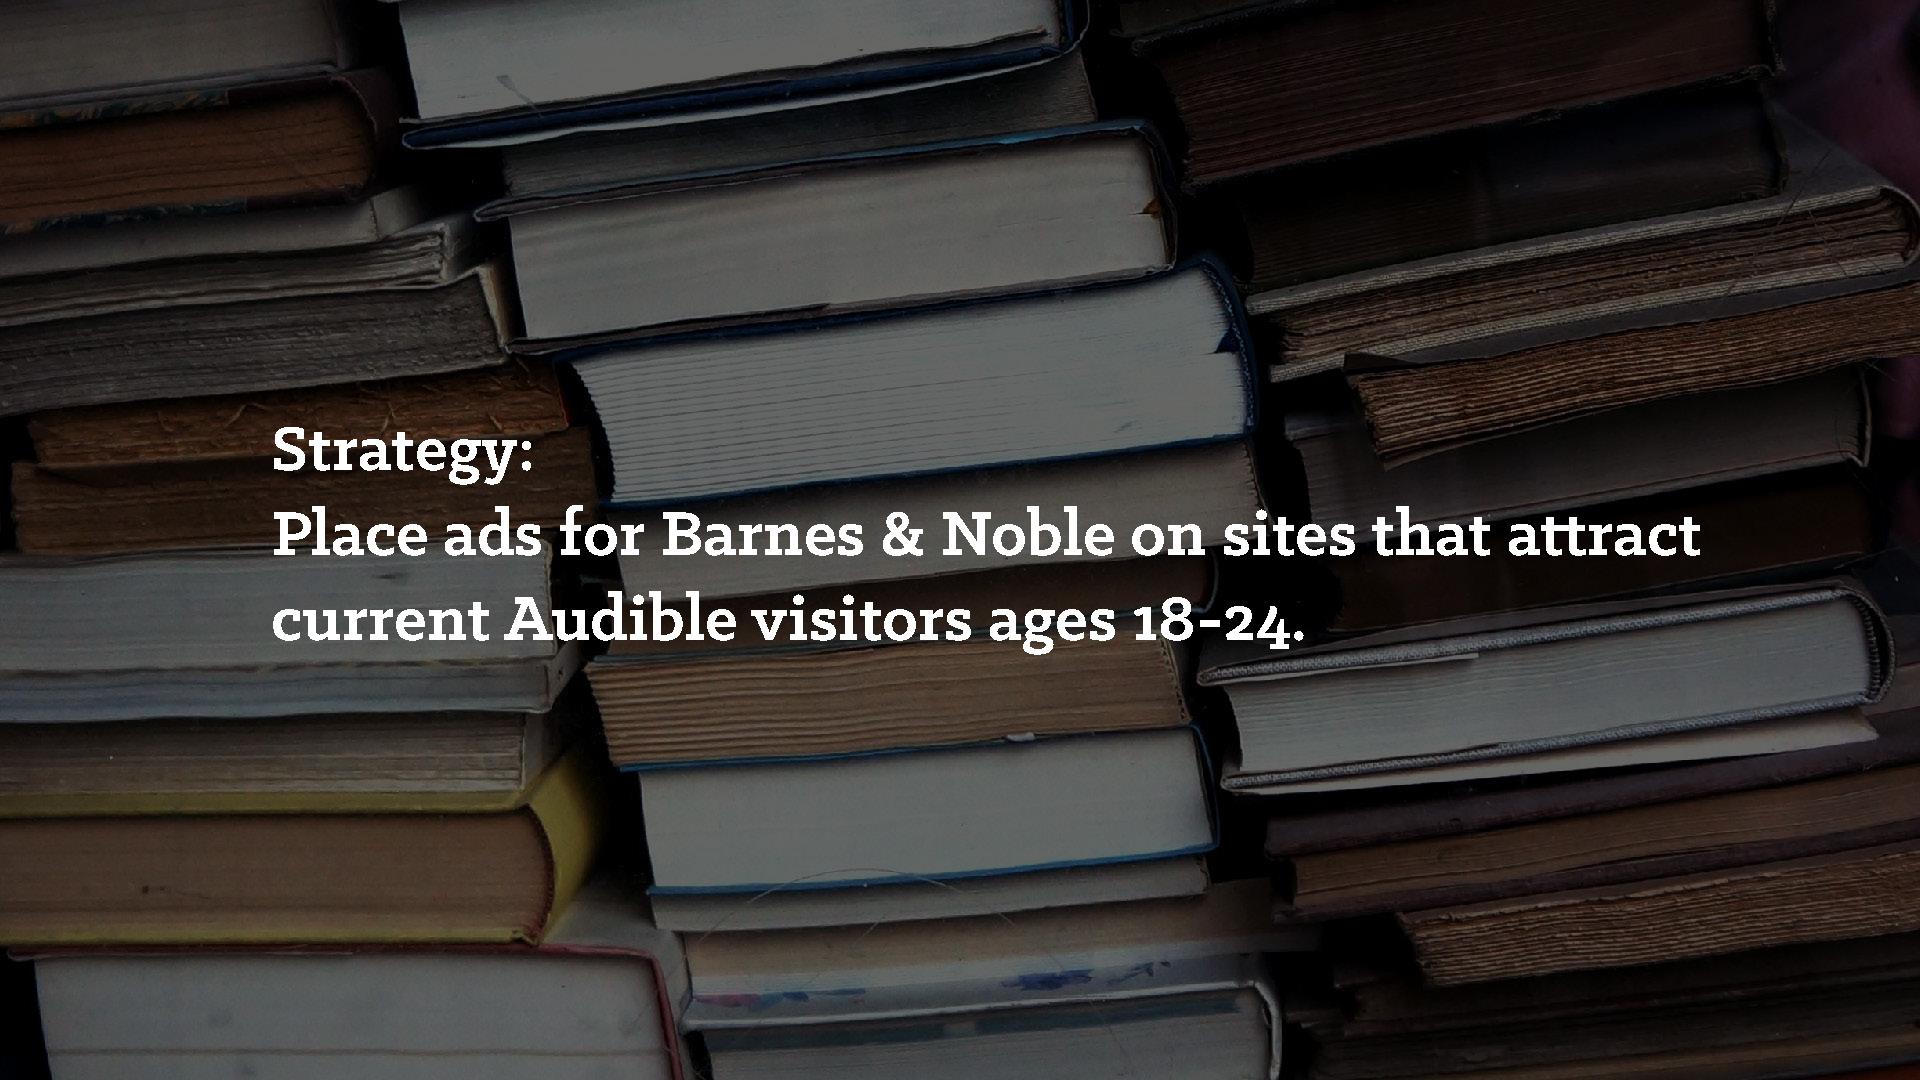 Lewman_comScore_Barnes&Noble_Page_12.jpg